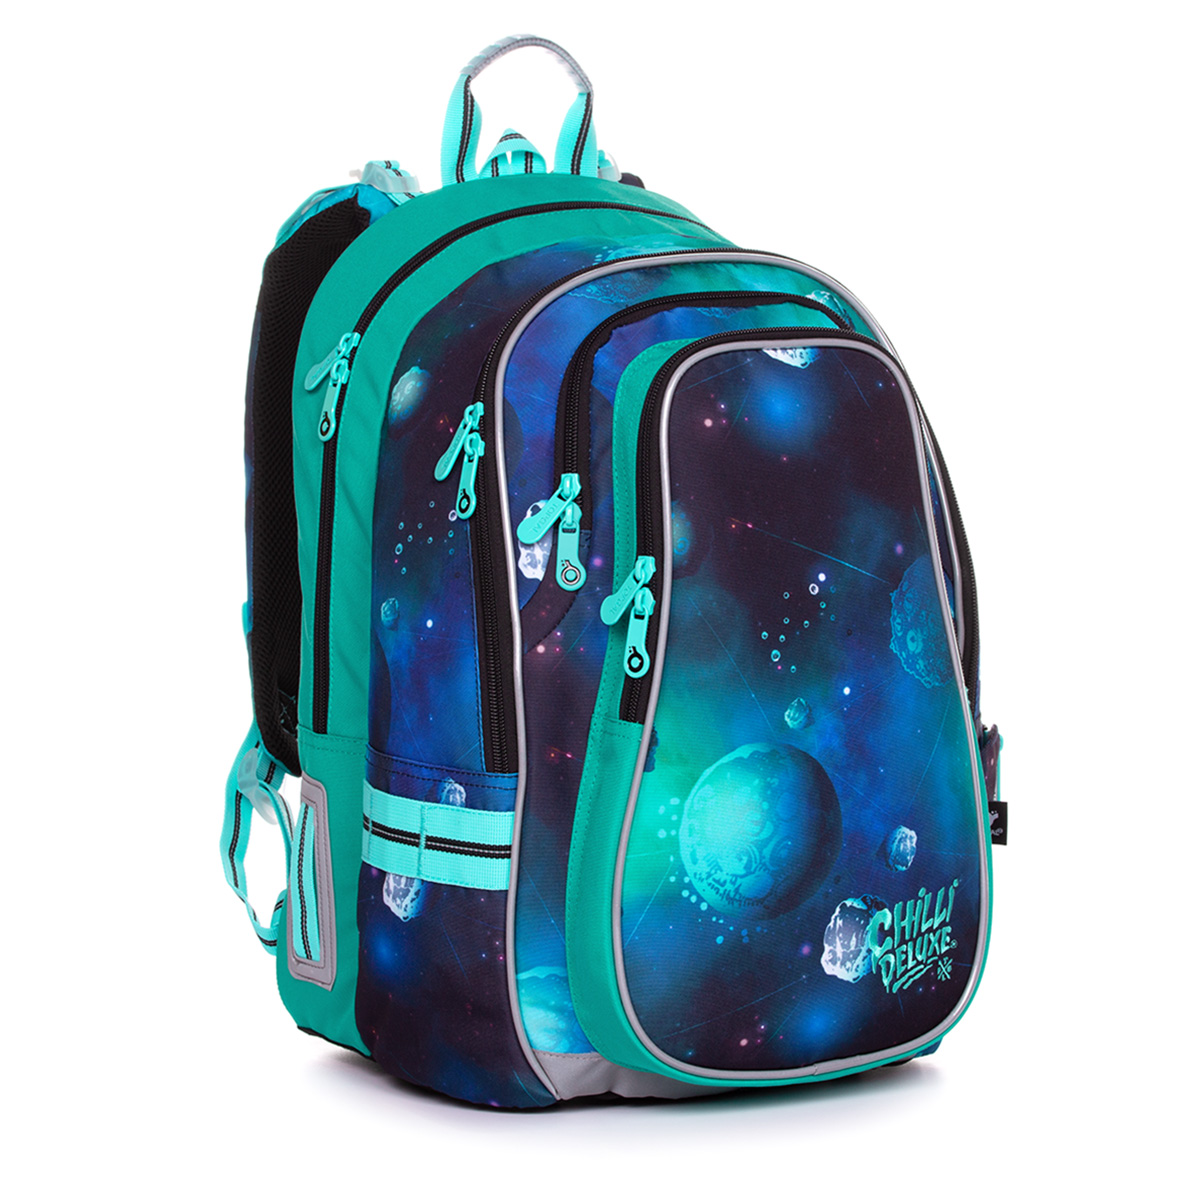 školská taška Topgal LYNN 20019 B